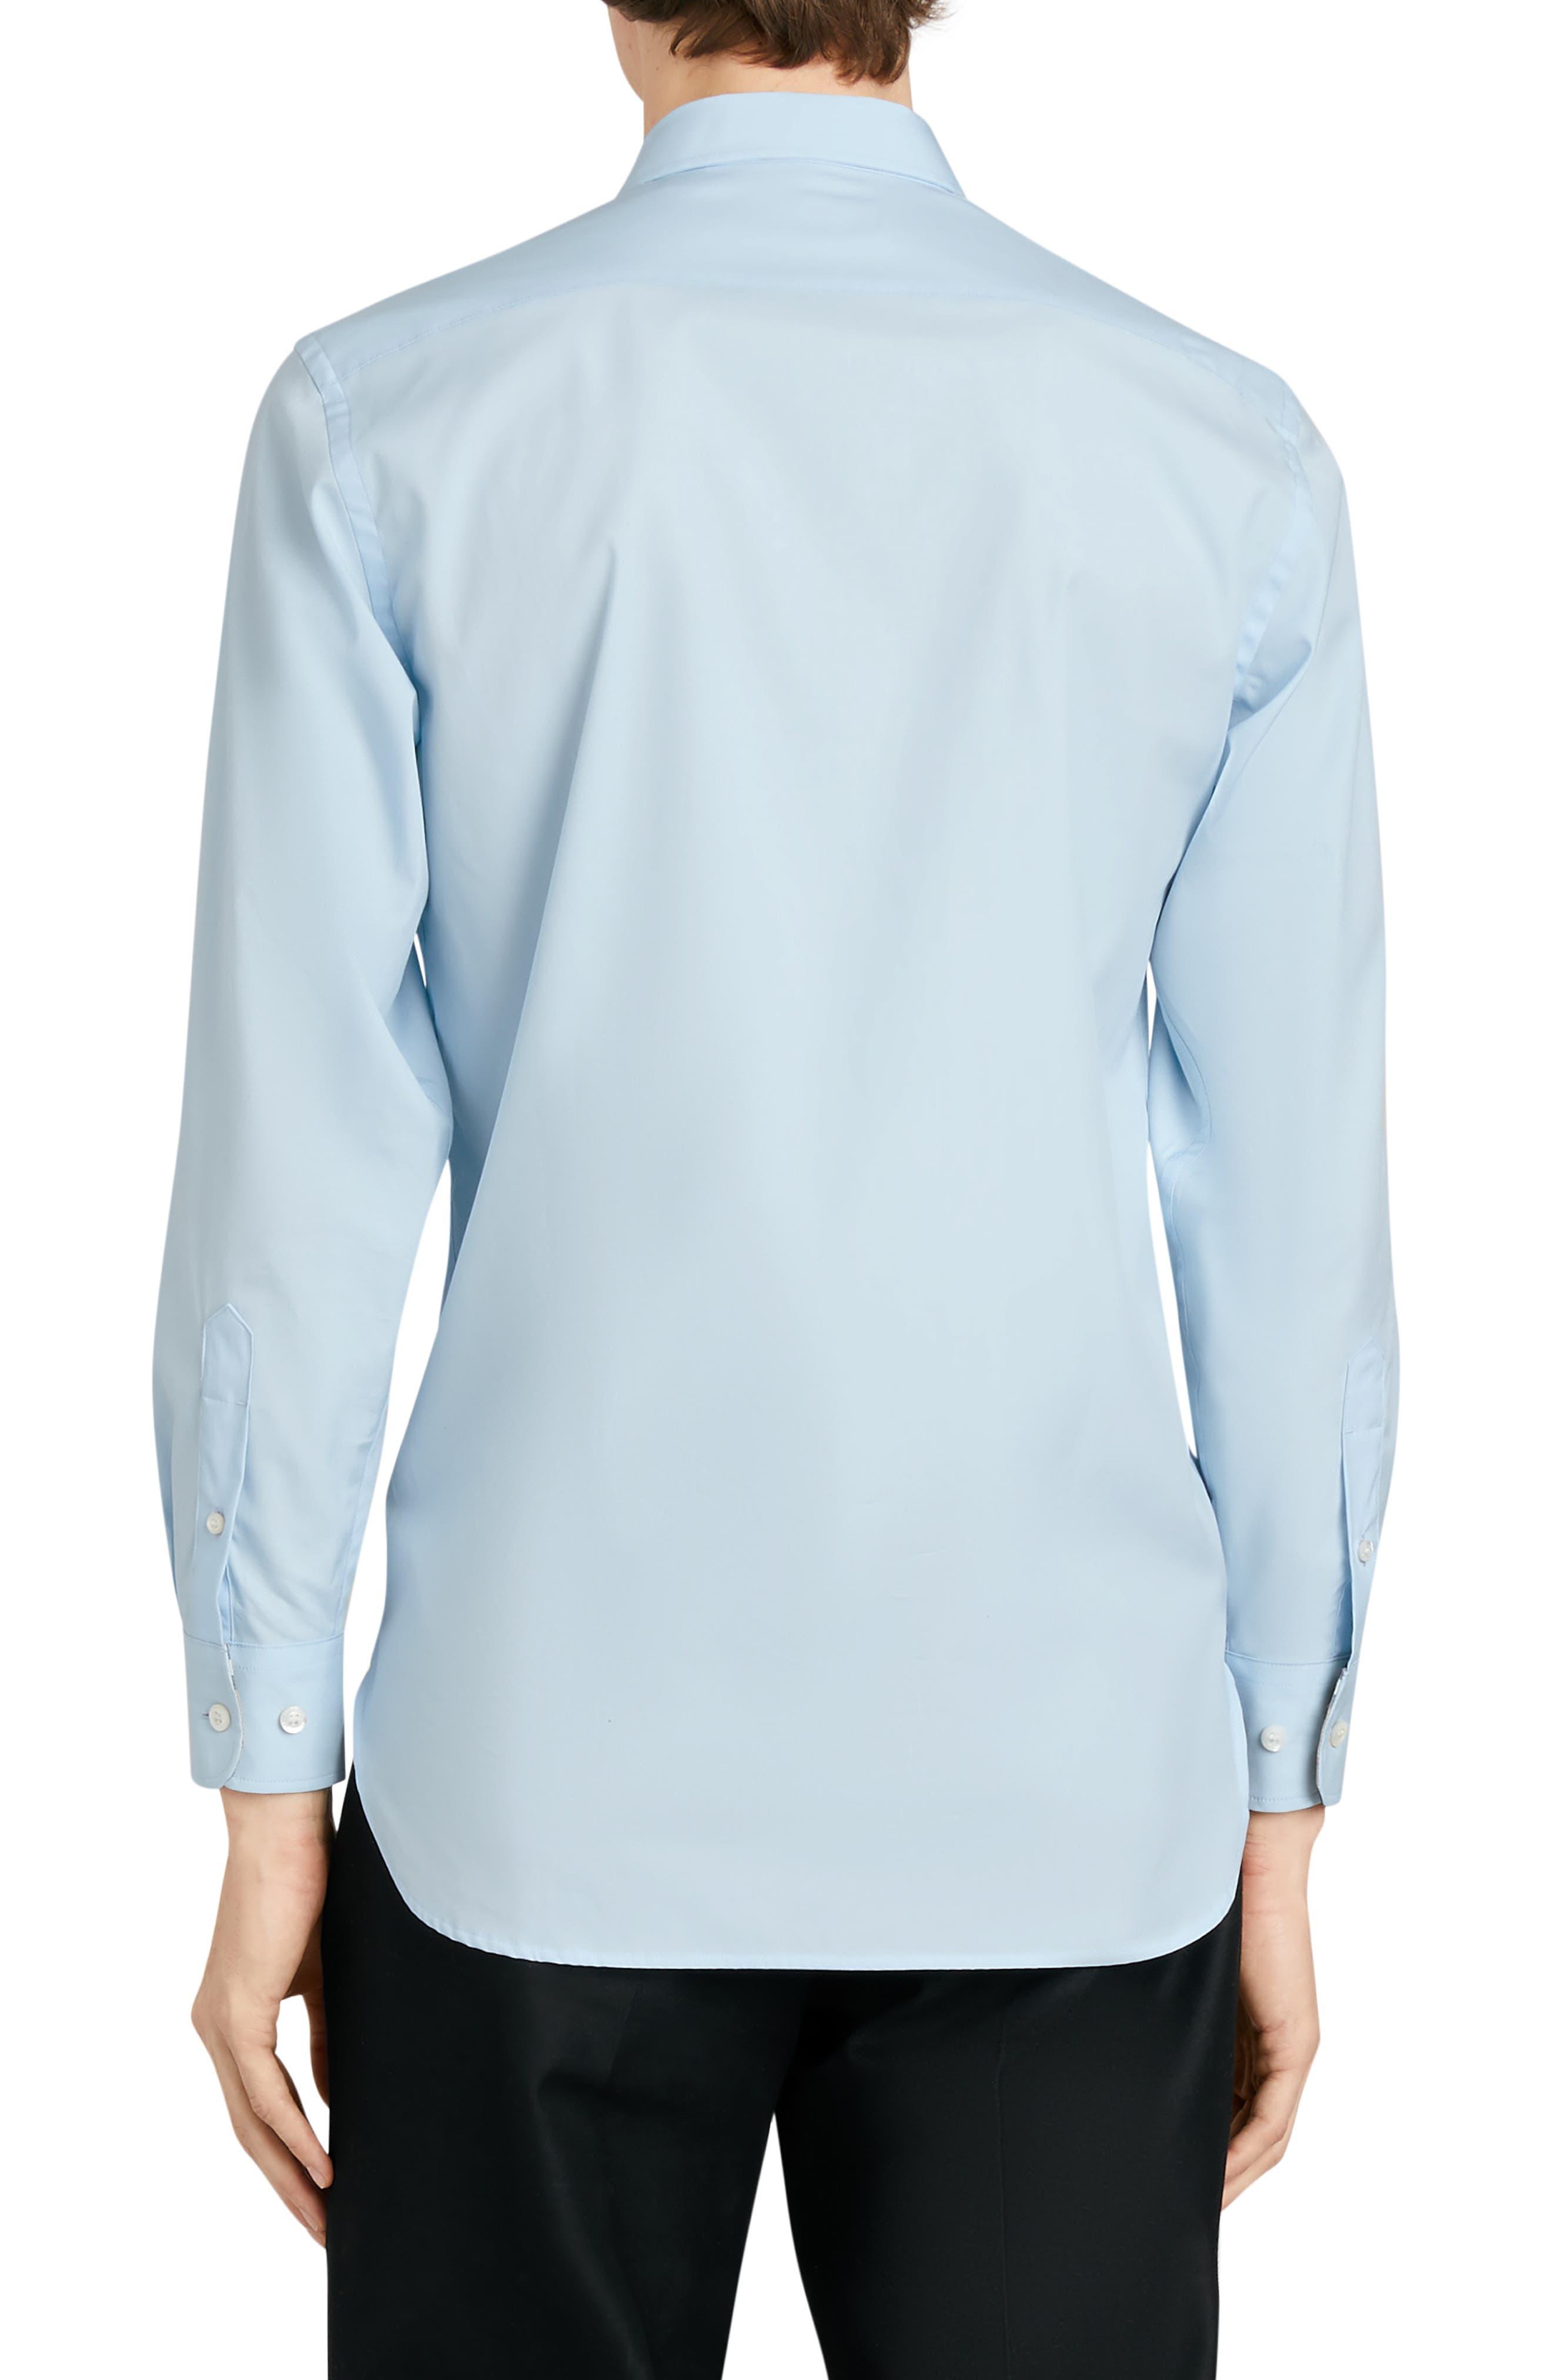 BURBERRY,                             William Stretch Poplin Sport Shirt,                             Alternate thumbnail 3, color,                             400